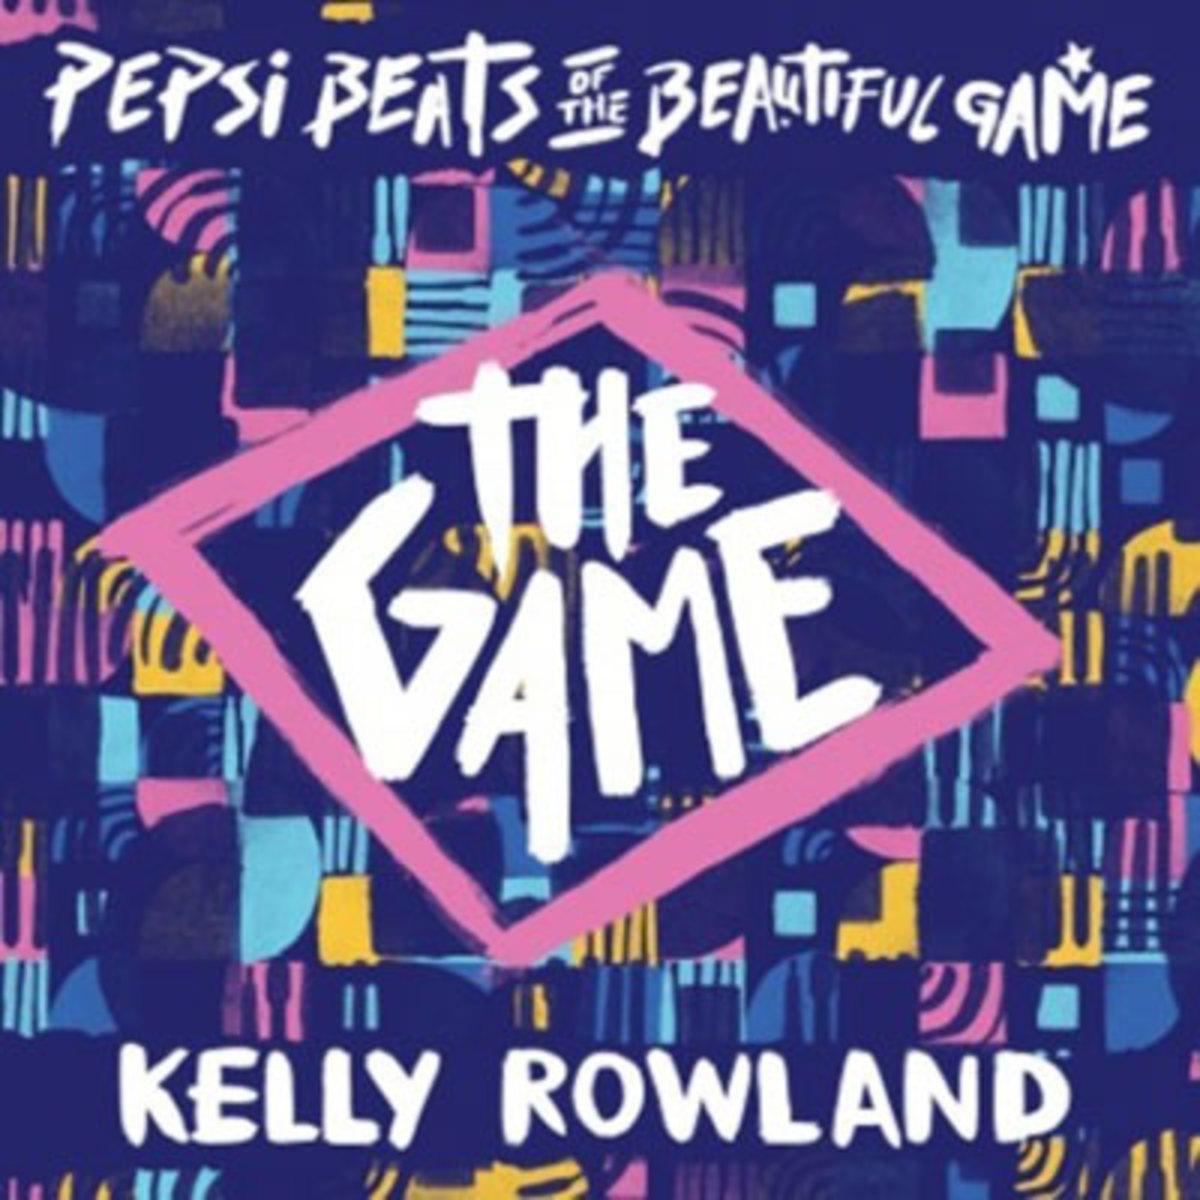 kellyrowland-thegame.jpg